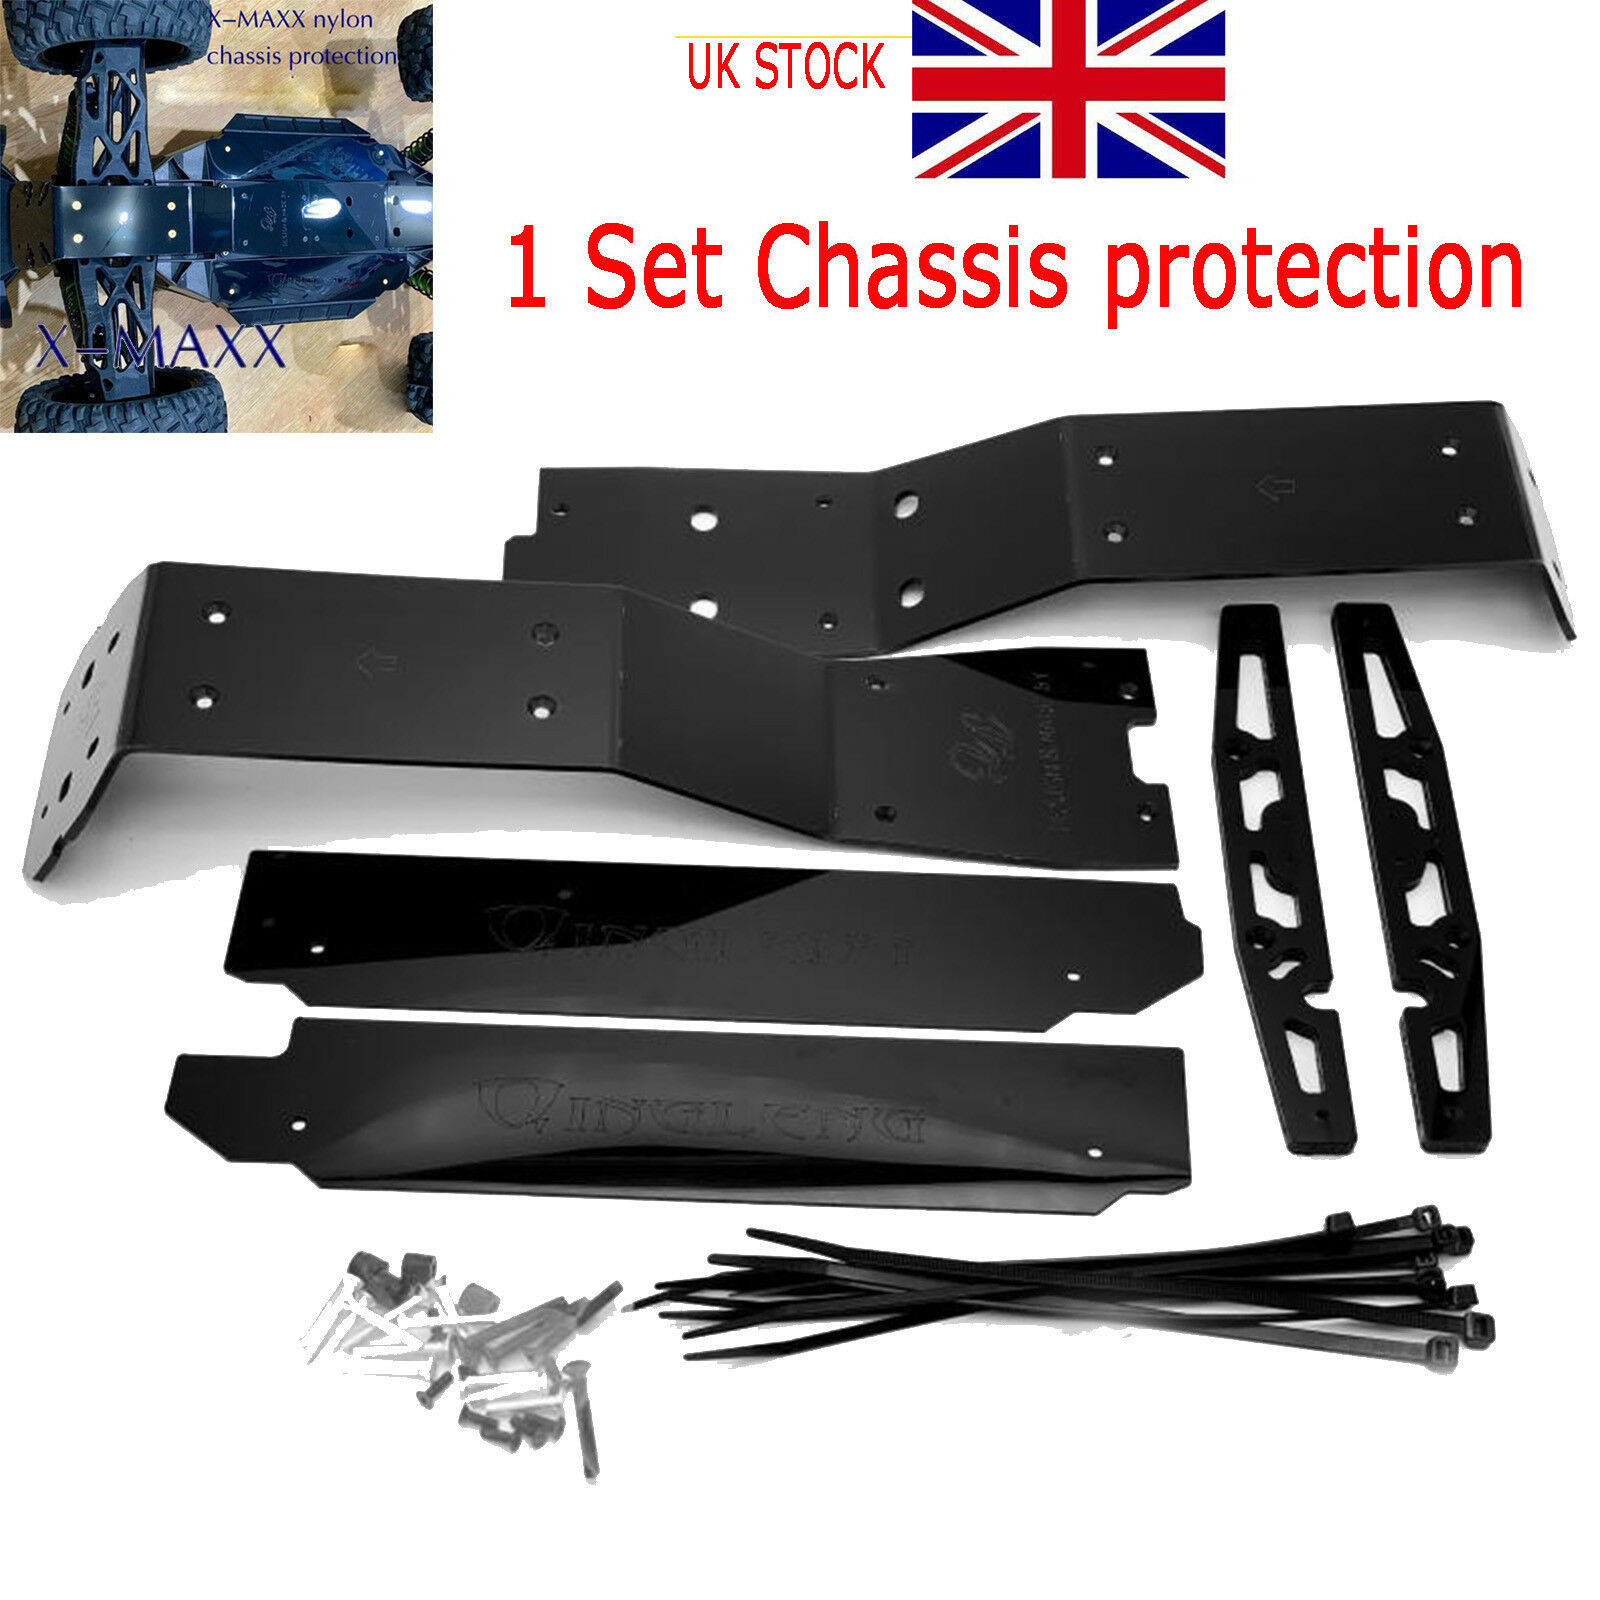 Wear-resisting Nylon Chassis Predection Skid Plate for TRAXXAS X-MAXX XMAXX